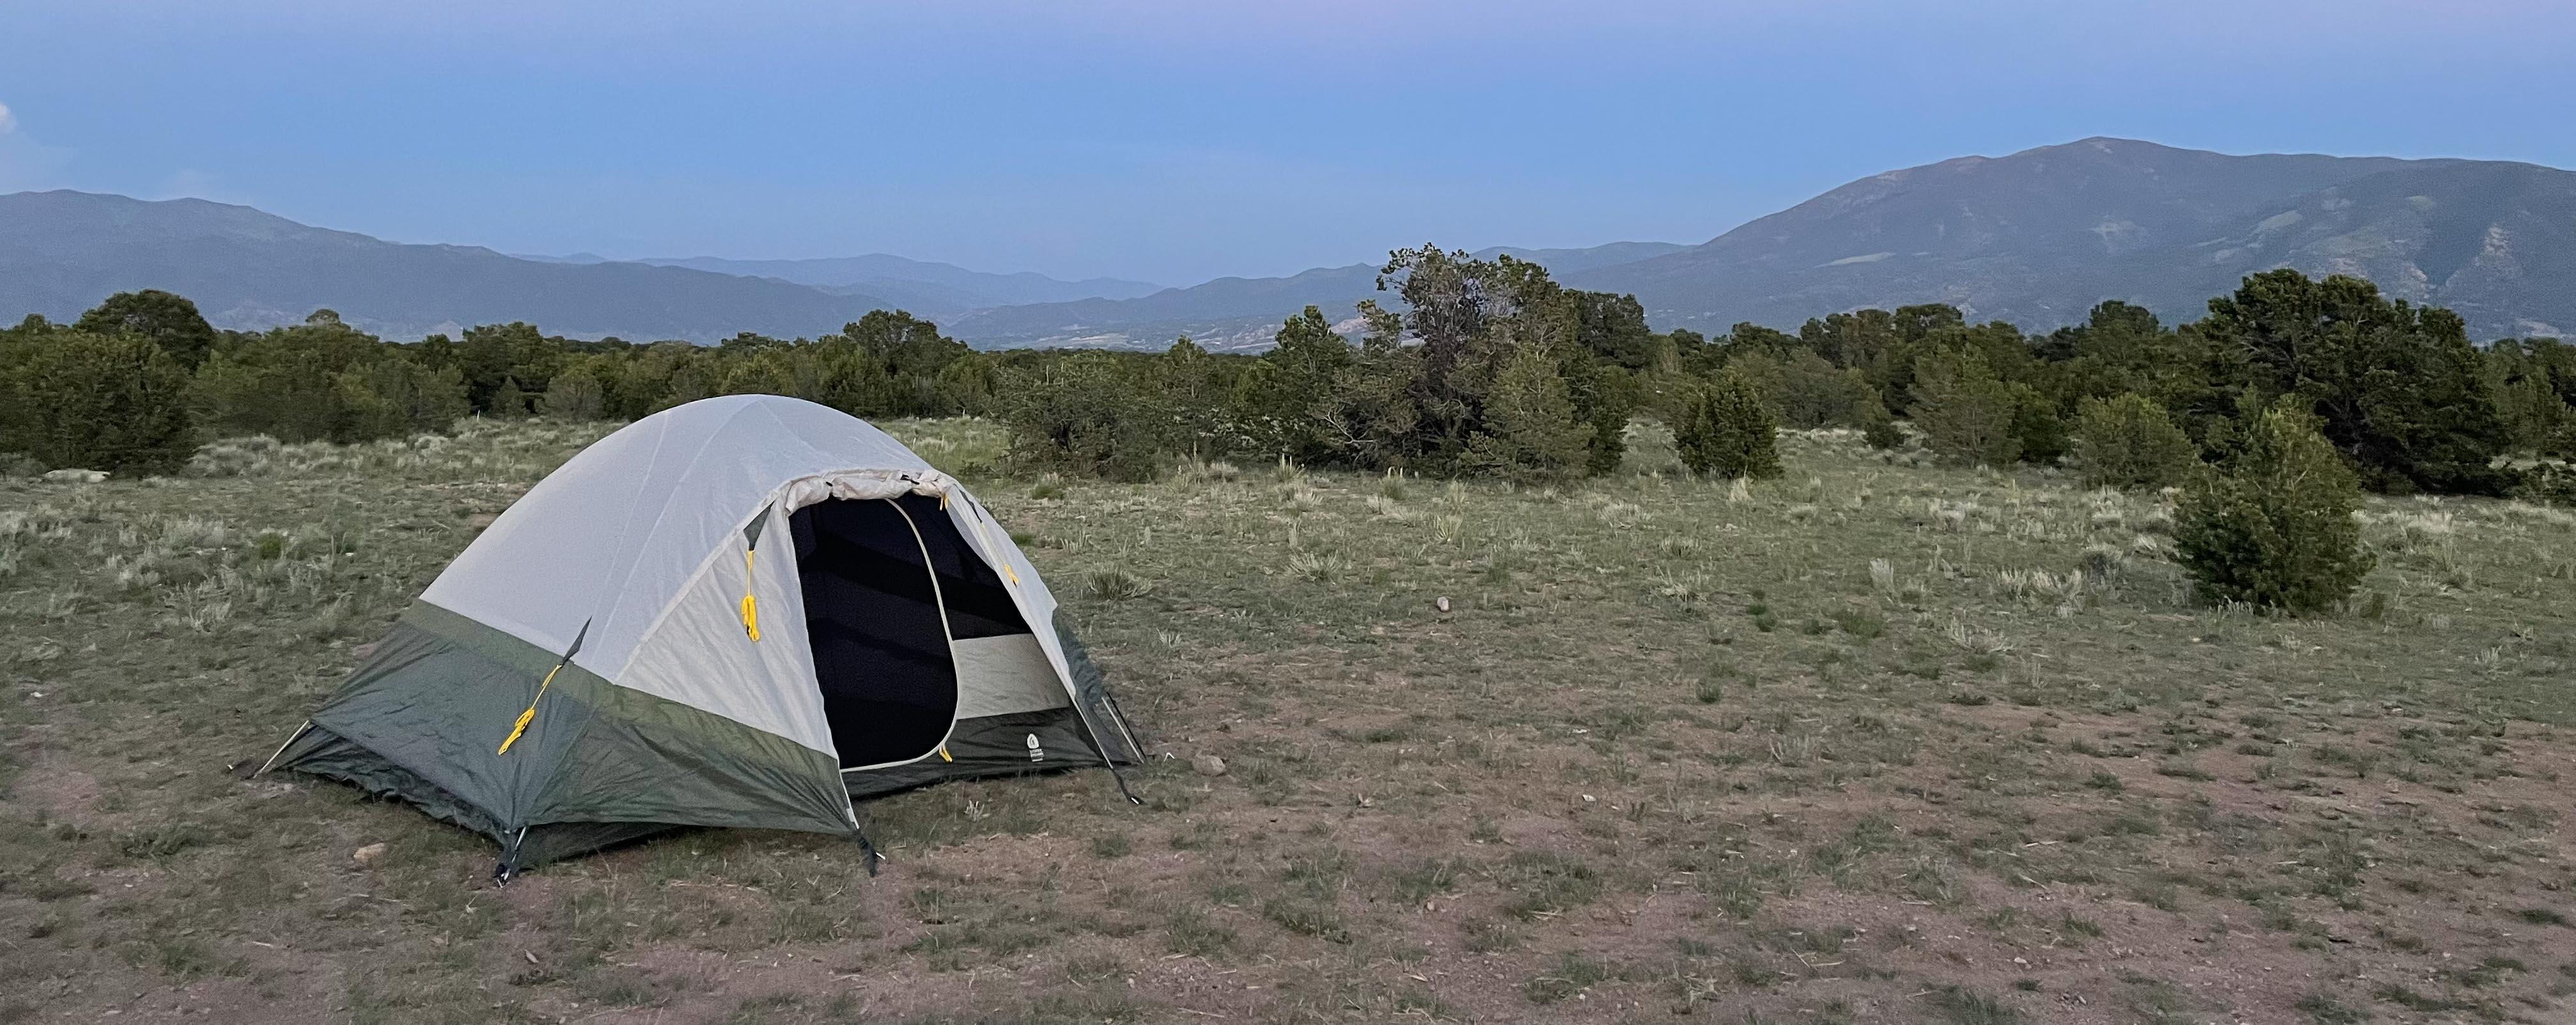 sierra-designs-tabernash-4-review-dirtbagdreams.com